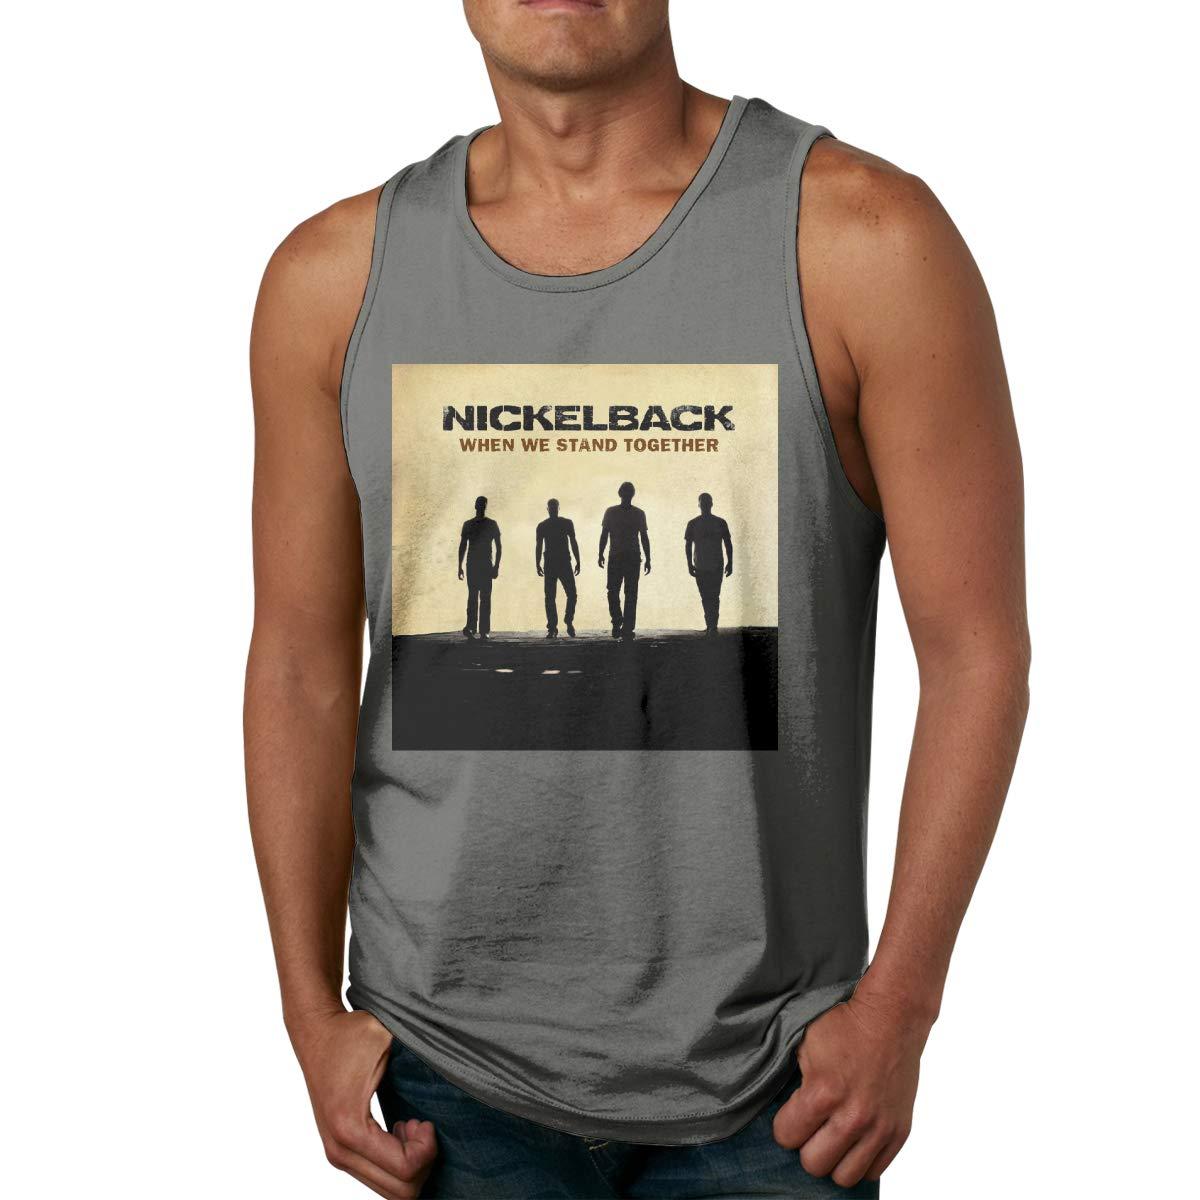 S Sport Gym Tank Tops Nickelback Sleeveless T Shirts